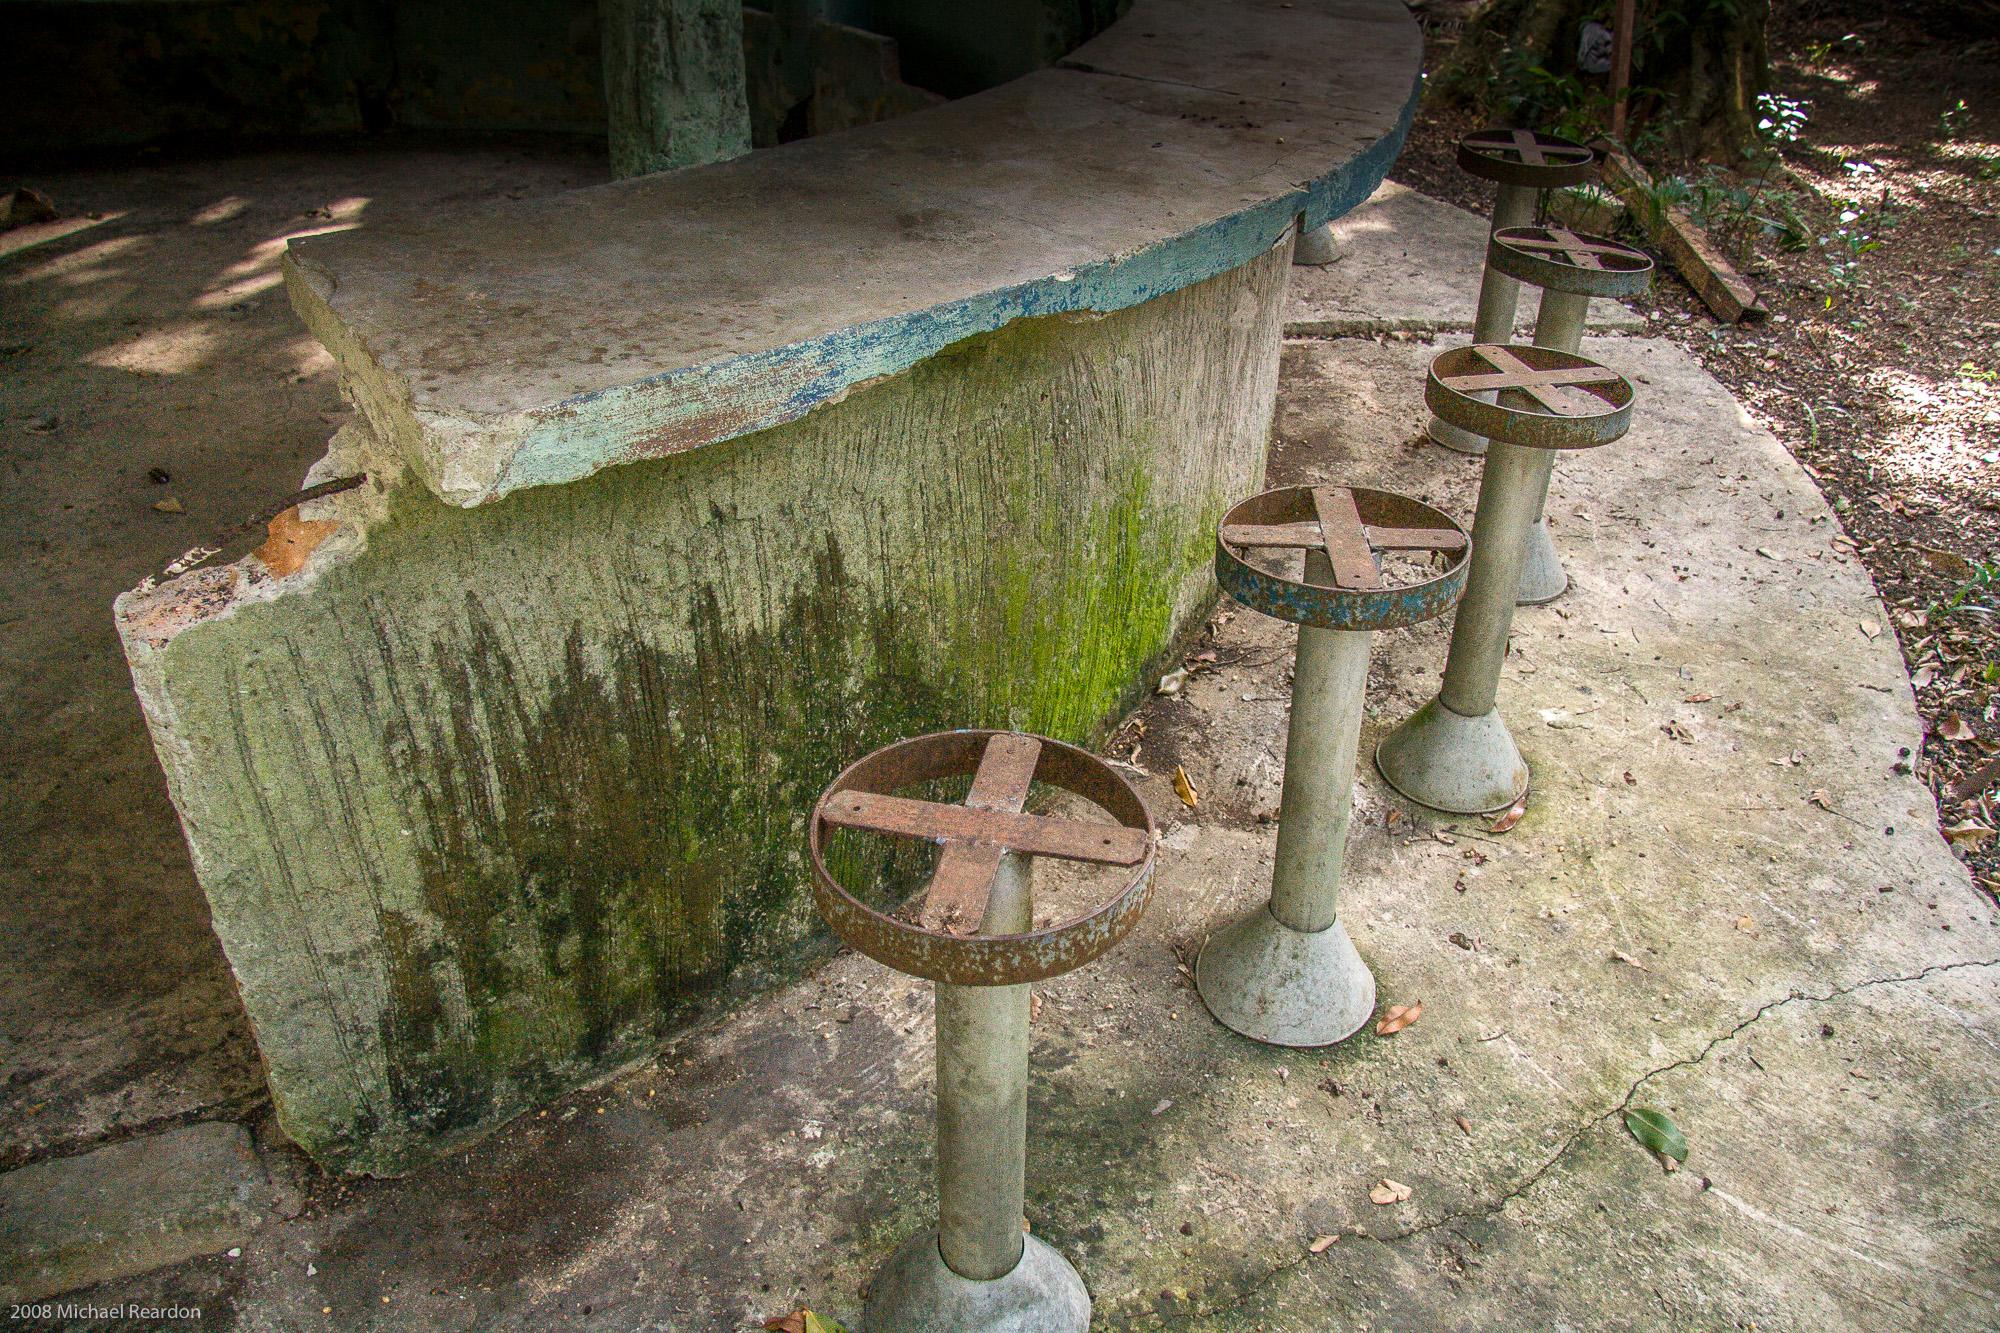 havana-jardin-tropical-6190